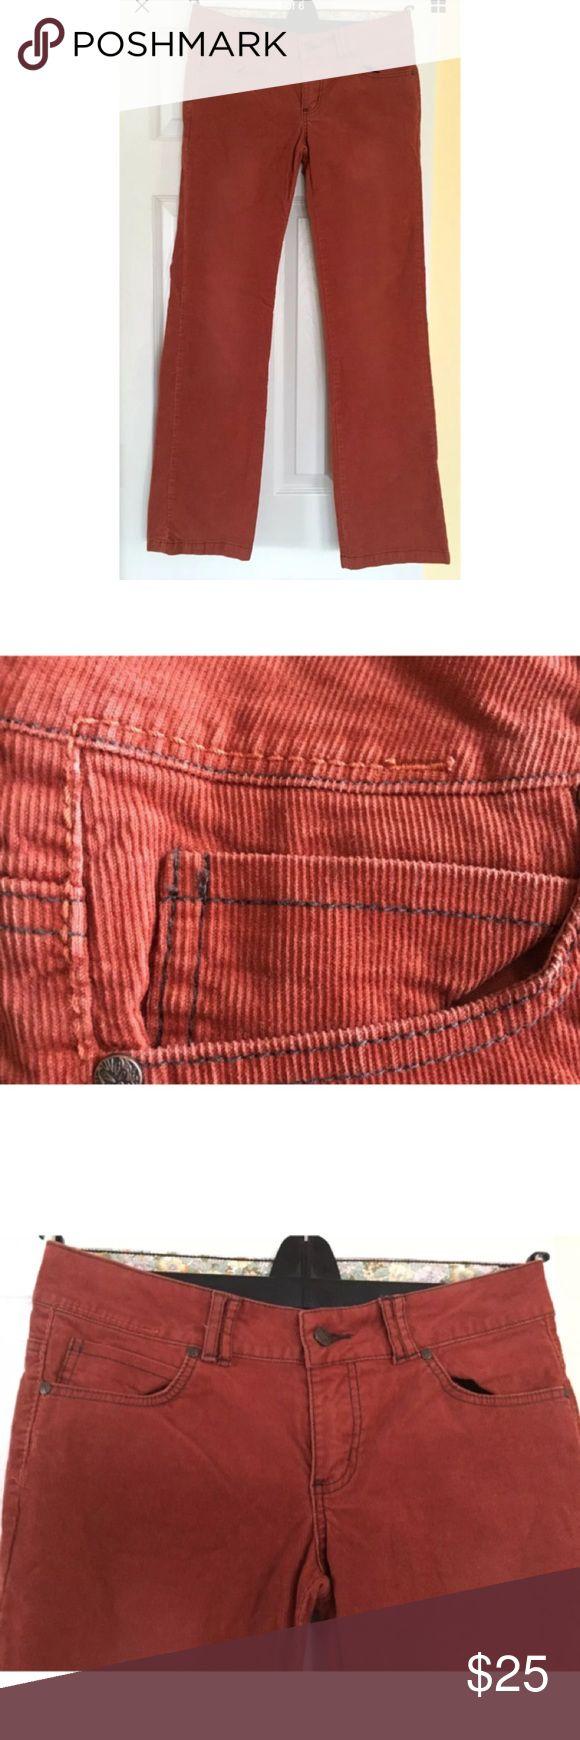 Prana Canyon Cord Pants Rust Orange PrAna Canyon Cord pants  98% organic cotton, 2% spandex  Rust  5-pocket jeans styling  Floral fabric-lined waist    Size 0 Prana Pants